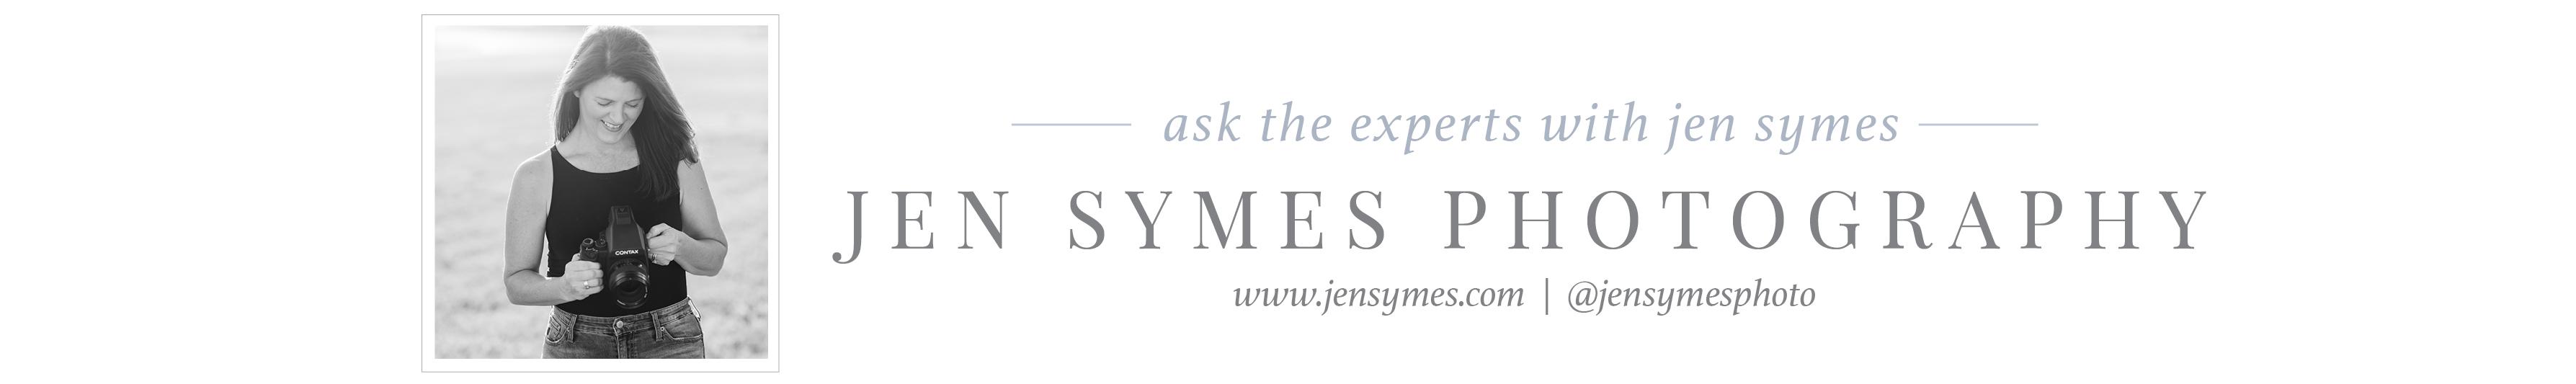 Jen Symes Photography